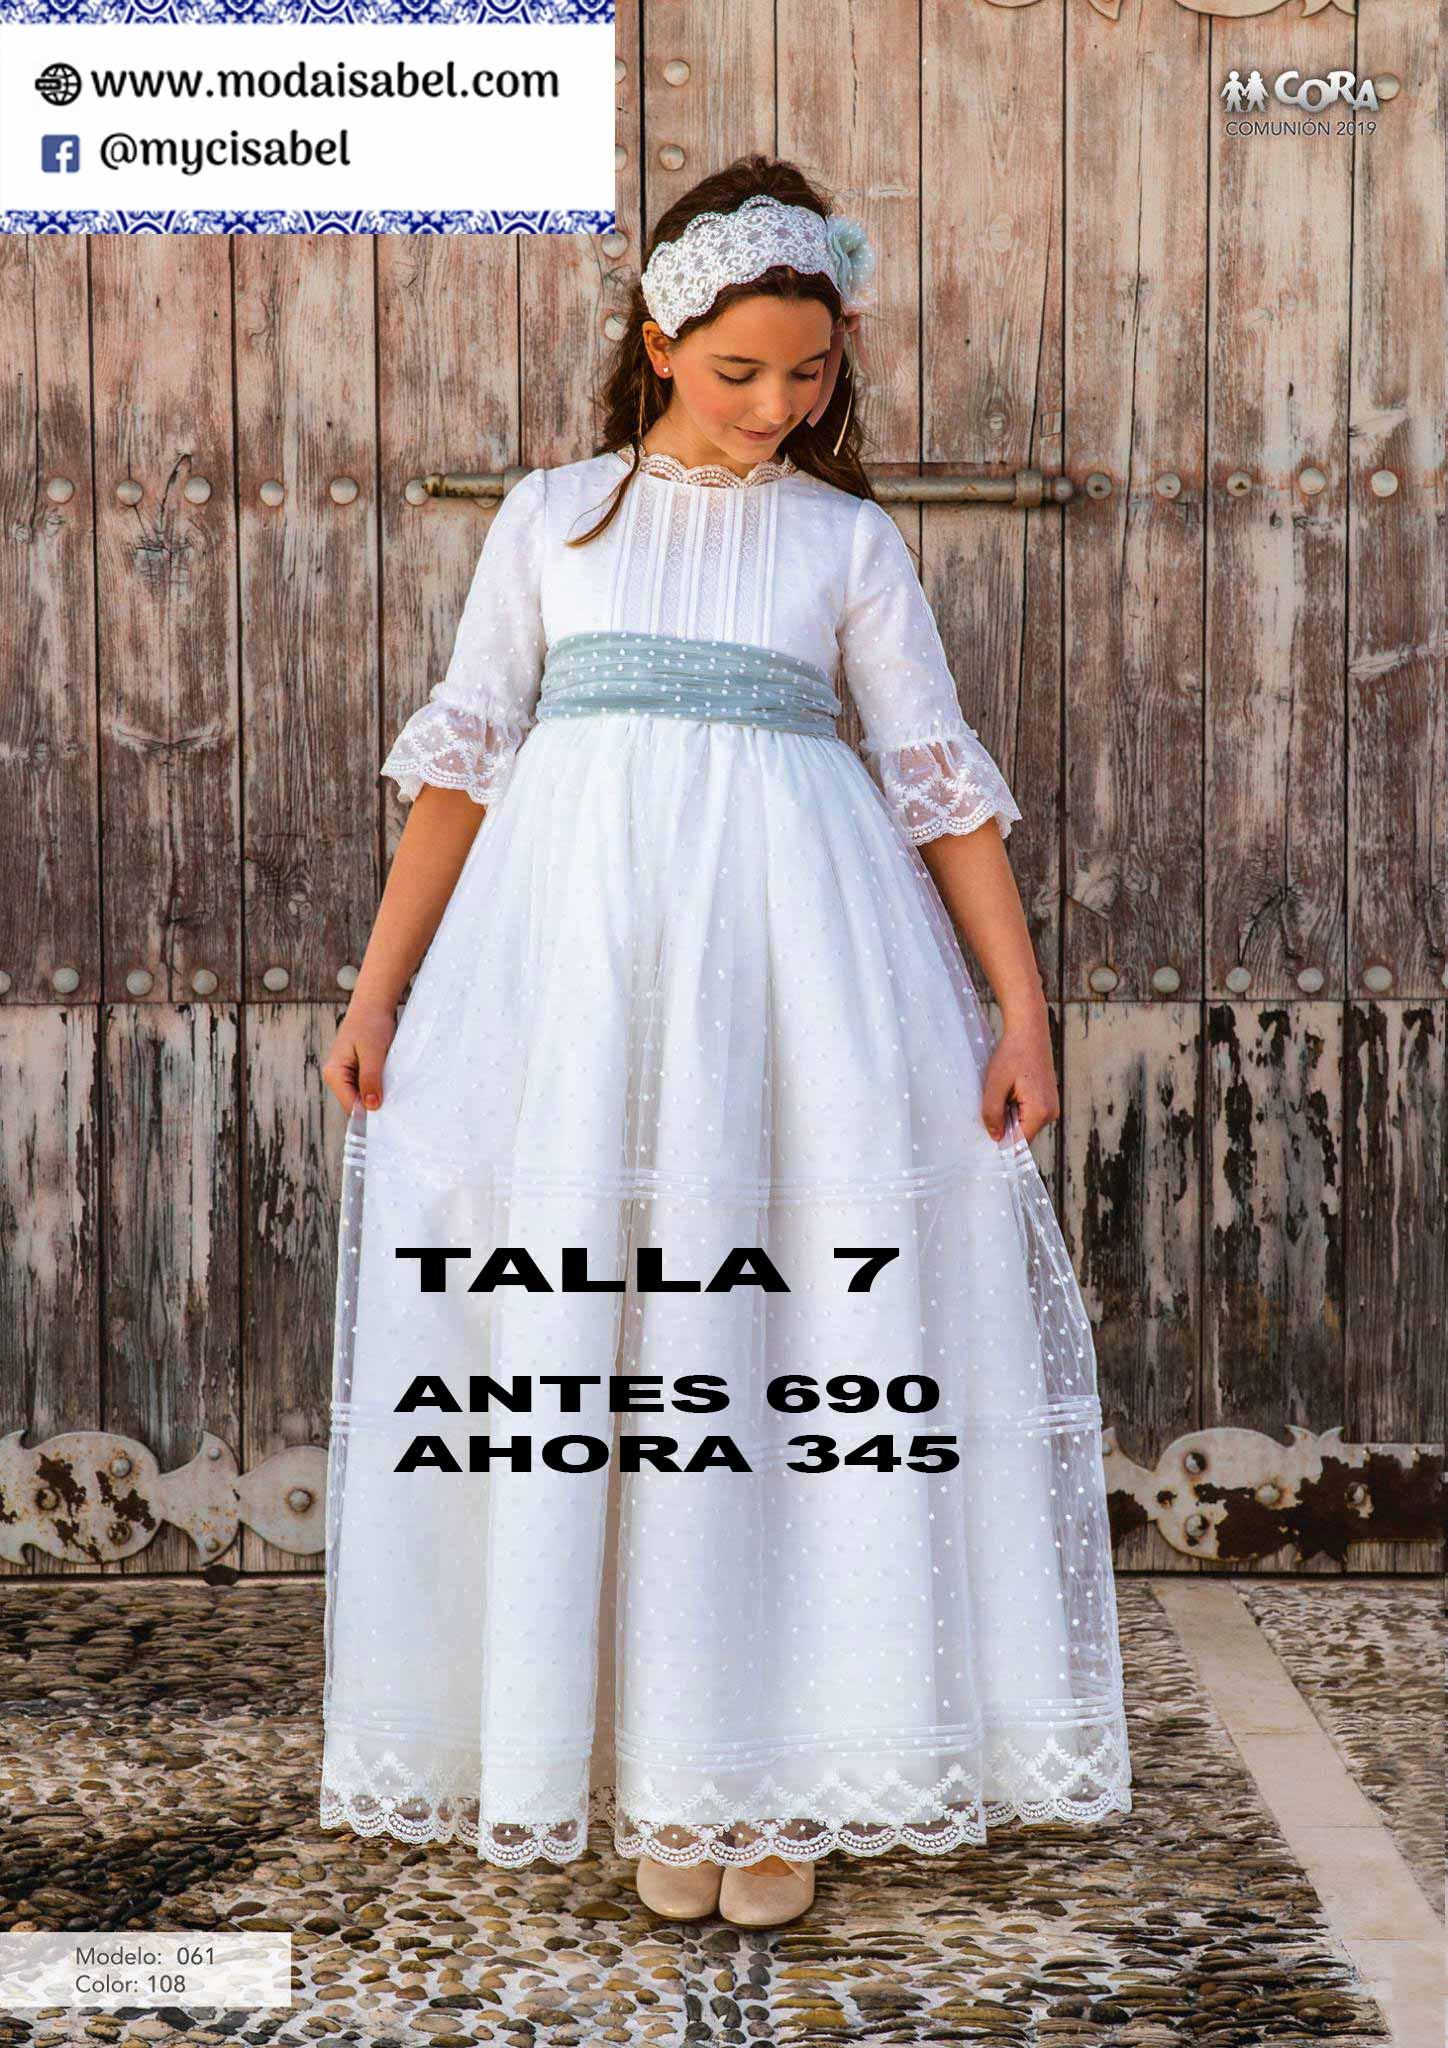 59 Vestido Comunion Outlet 2020 Cora Moda Isabel